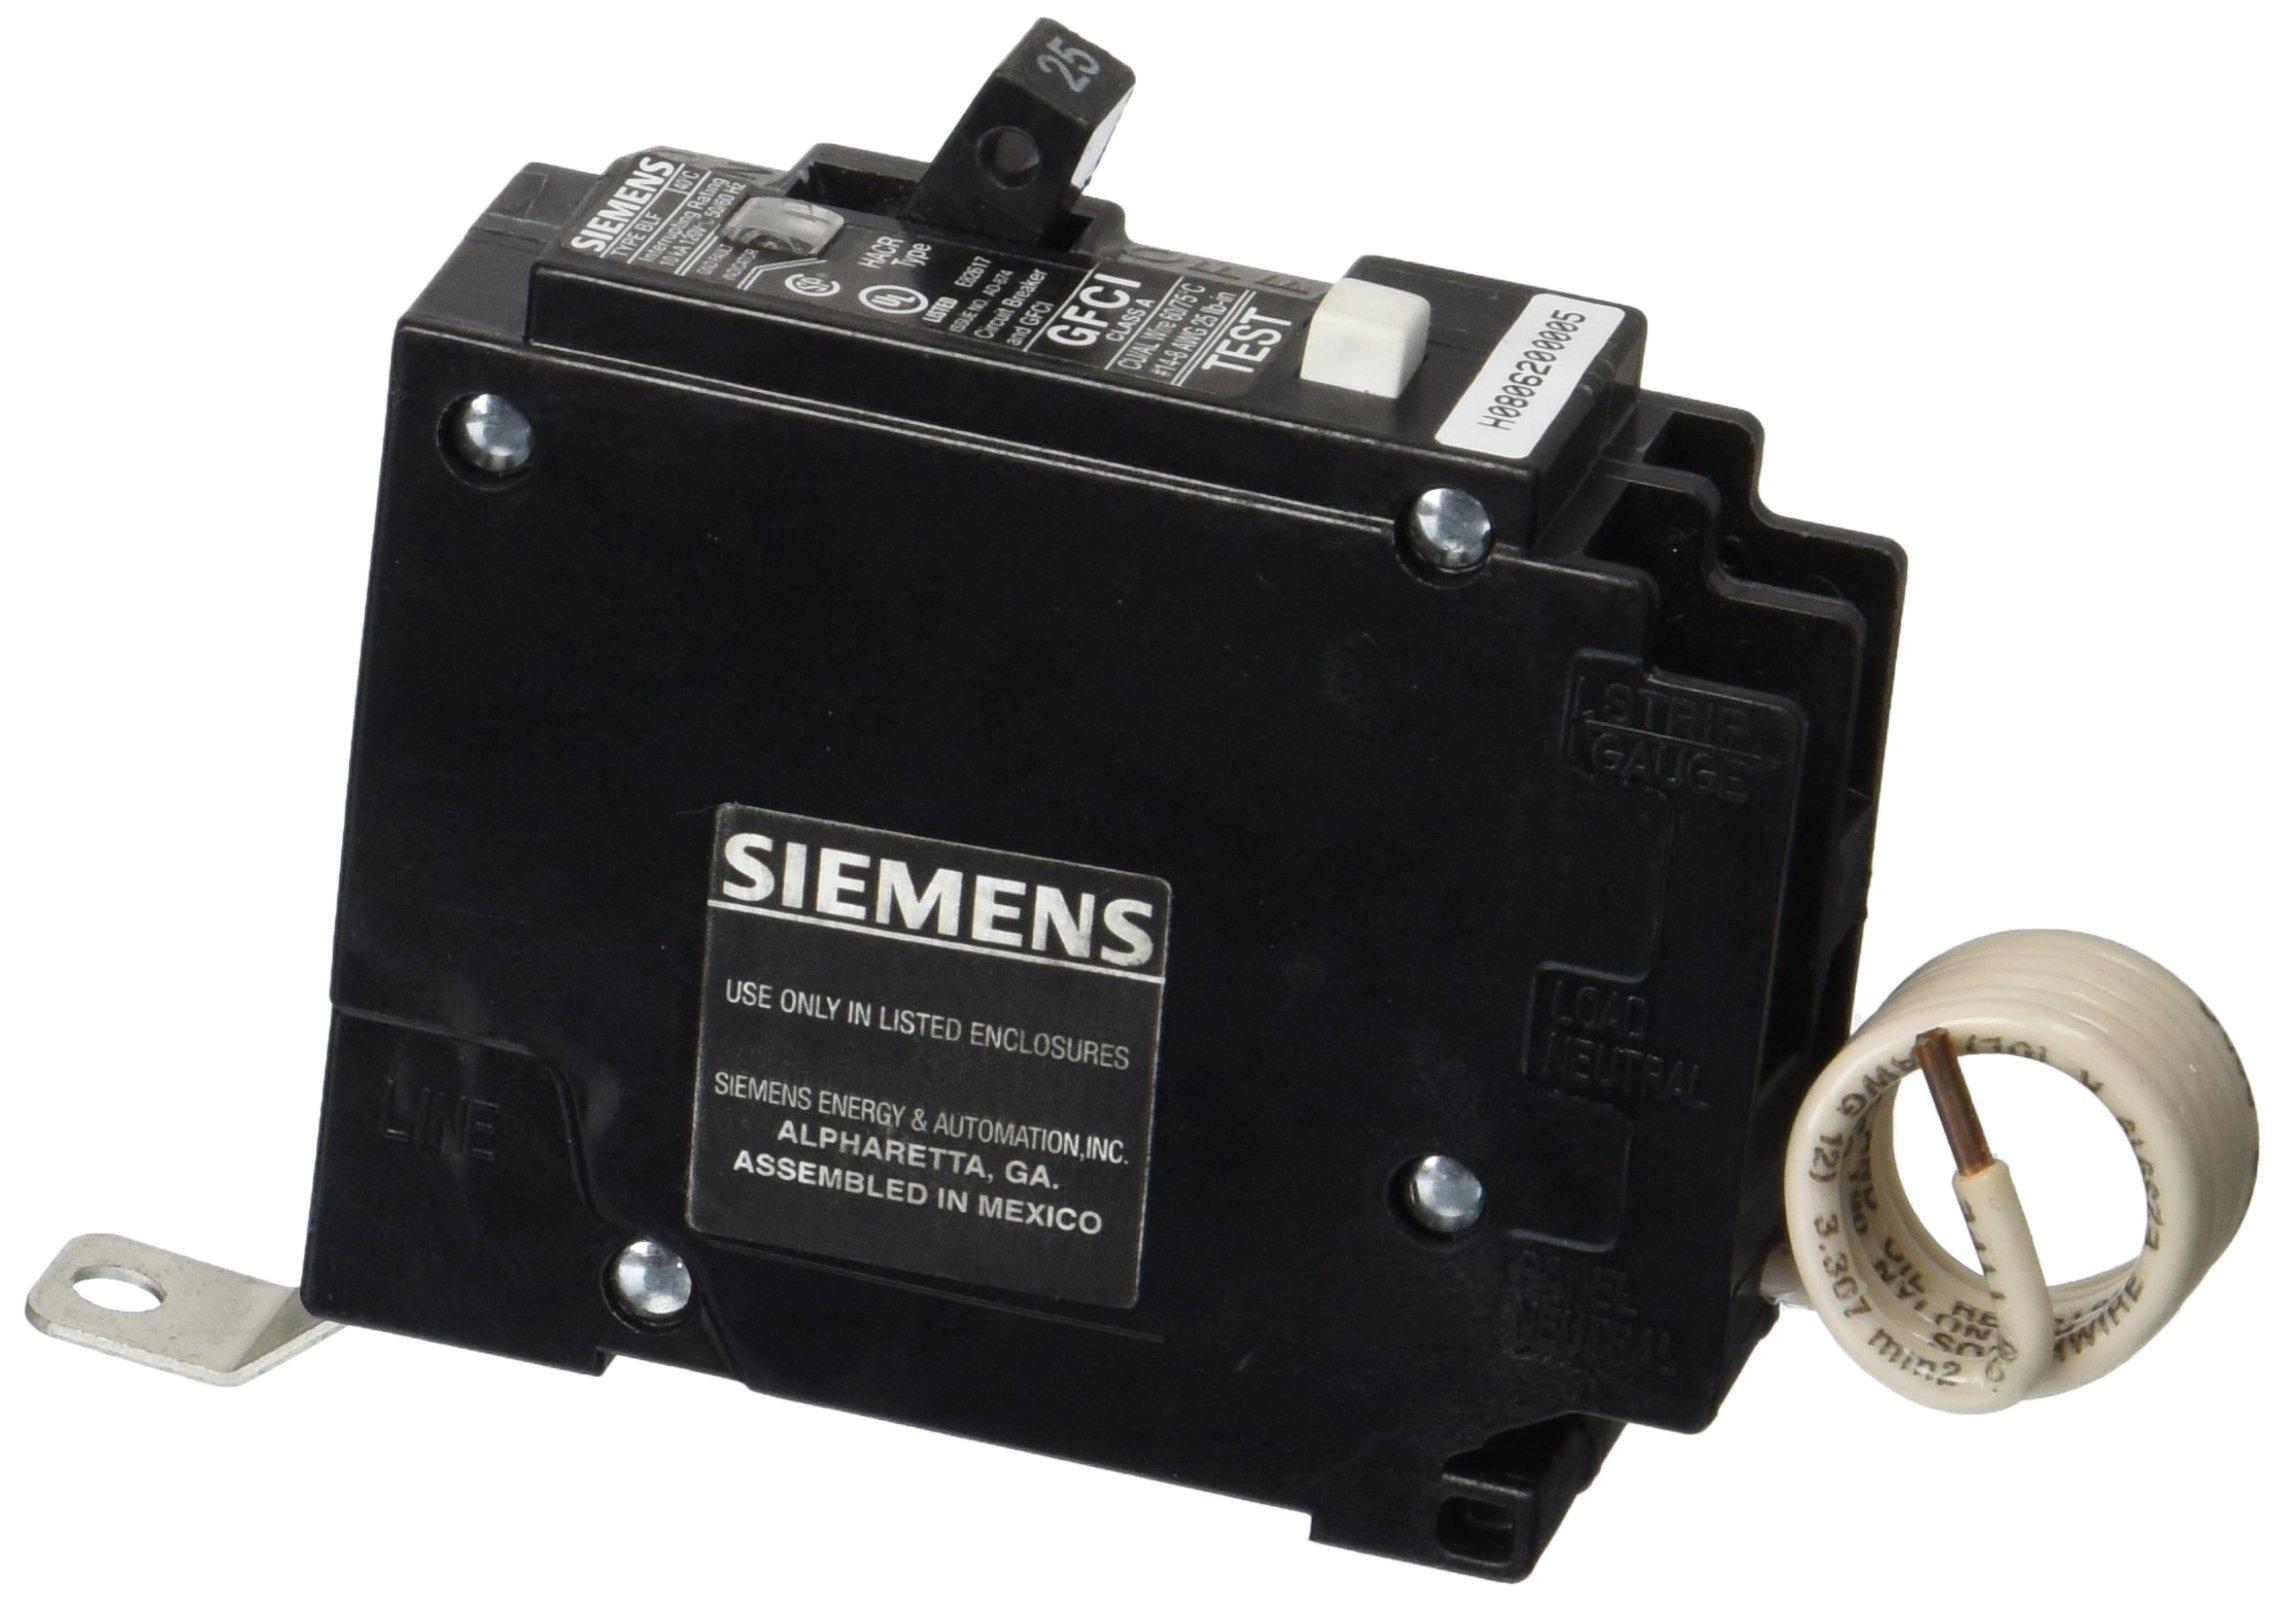 Siemens BF125 25-Amp Single Pole 120-Volt10KAIC Ground Fault Circuit interrupter